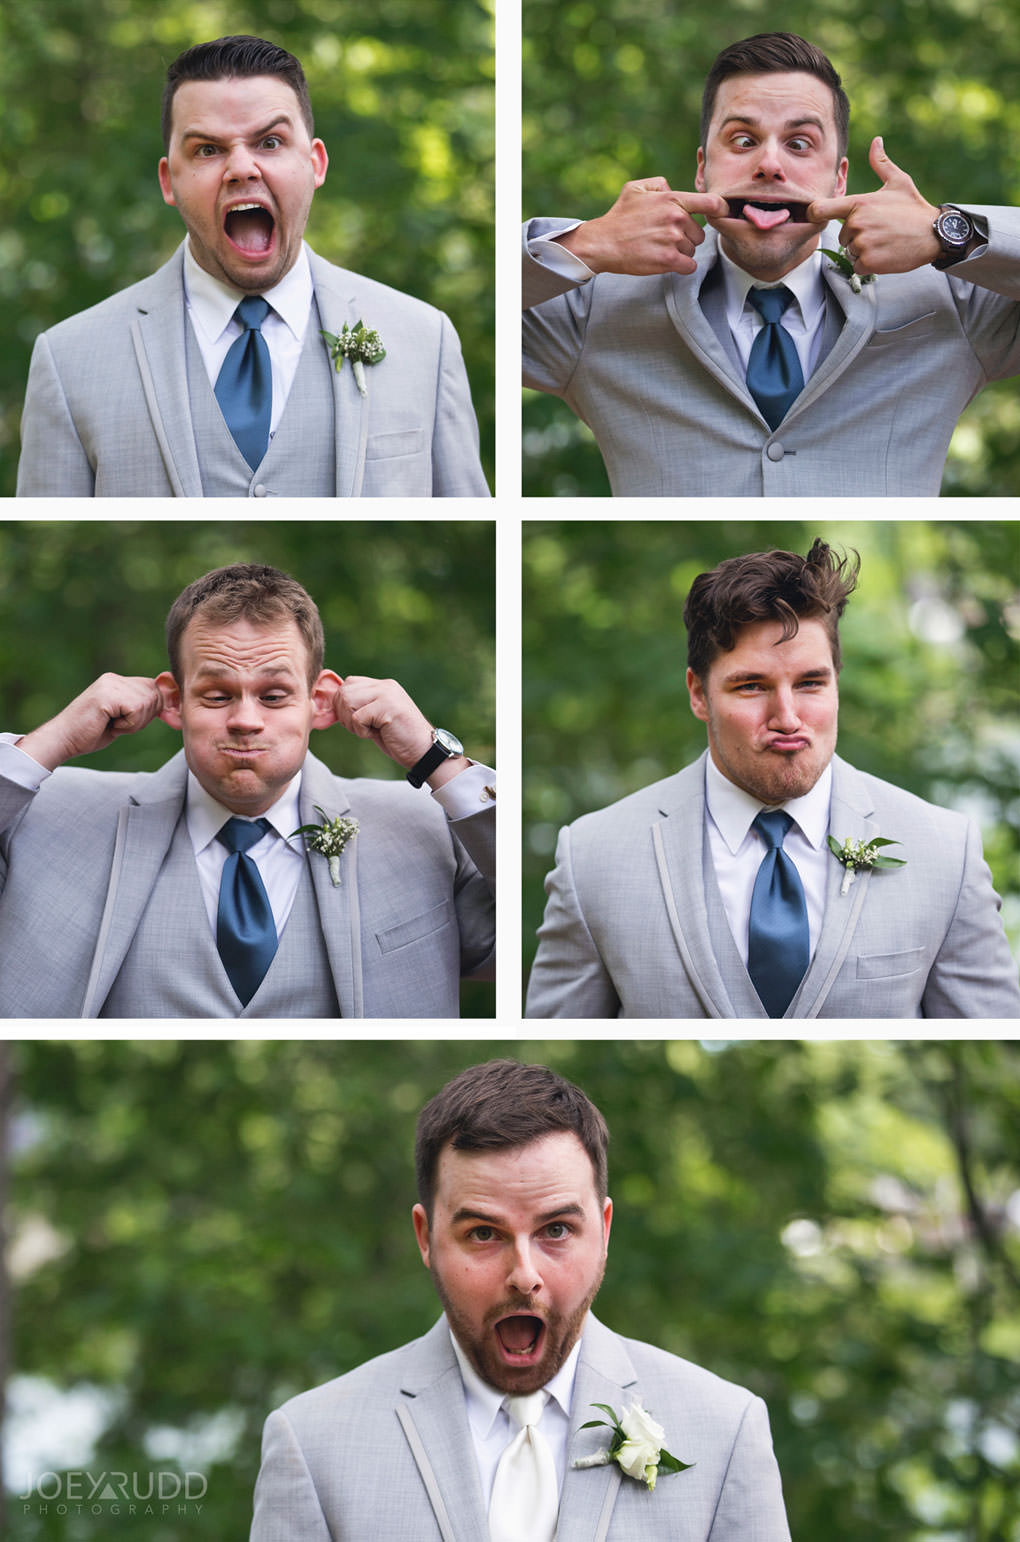 Val-des-Monts Wedding by Ottawa Wedding Photographer Joey Rudd Photography Cottage Wedding Wedding Party